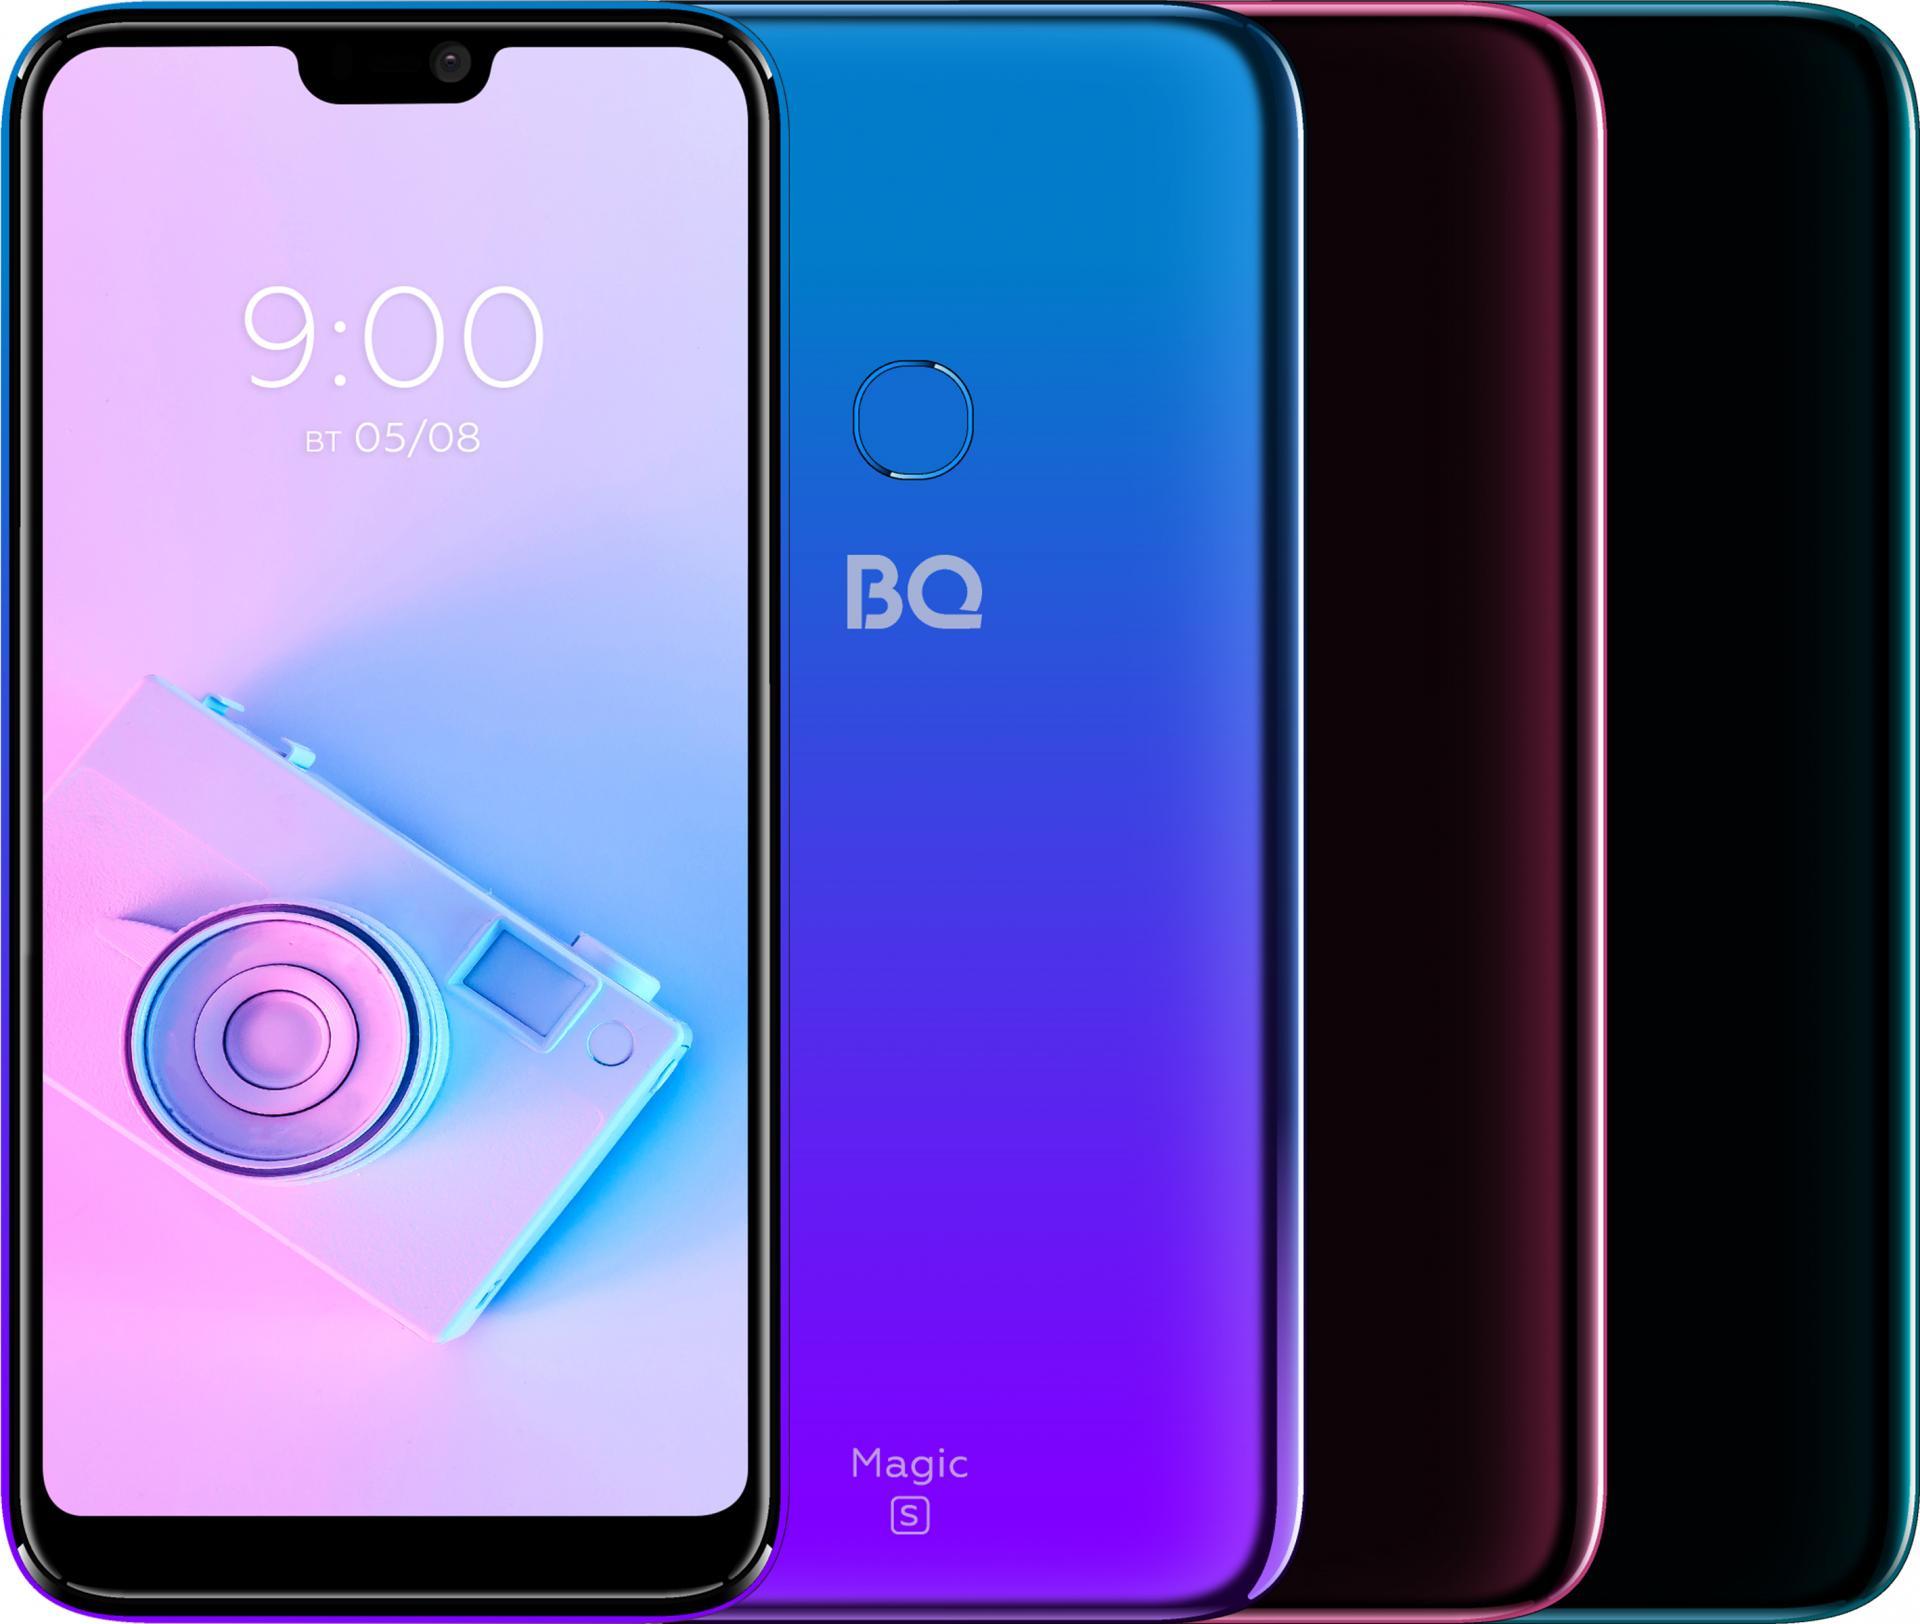 BQрешила запустить впродажу камерофон BQ5731L Magic S